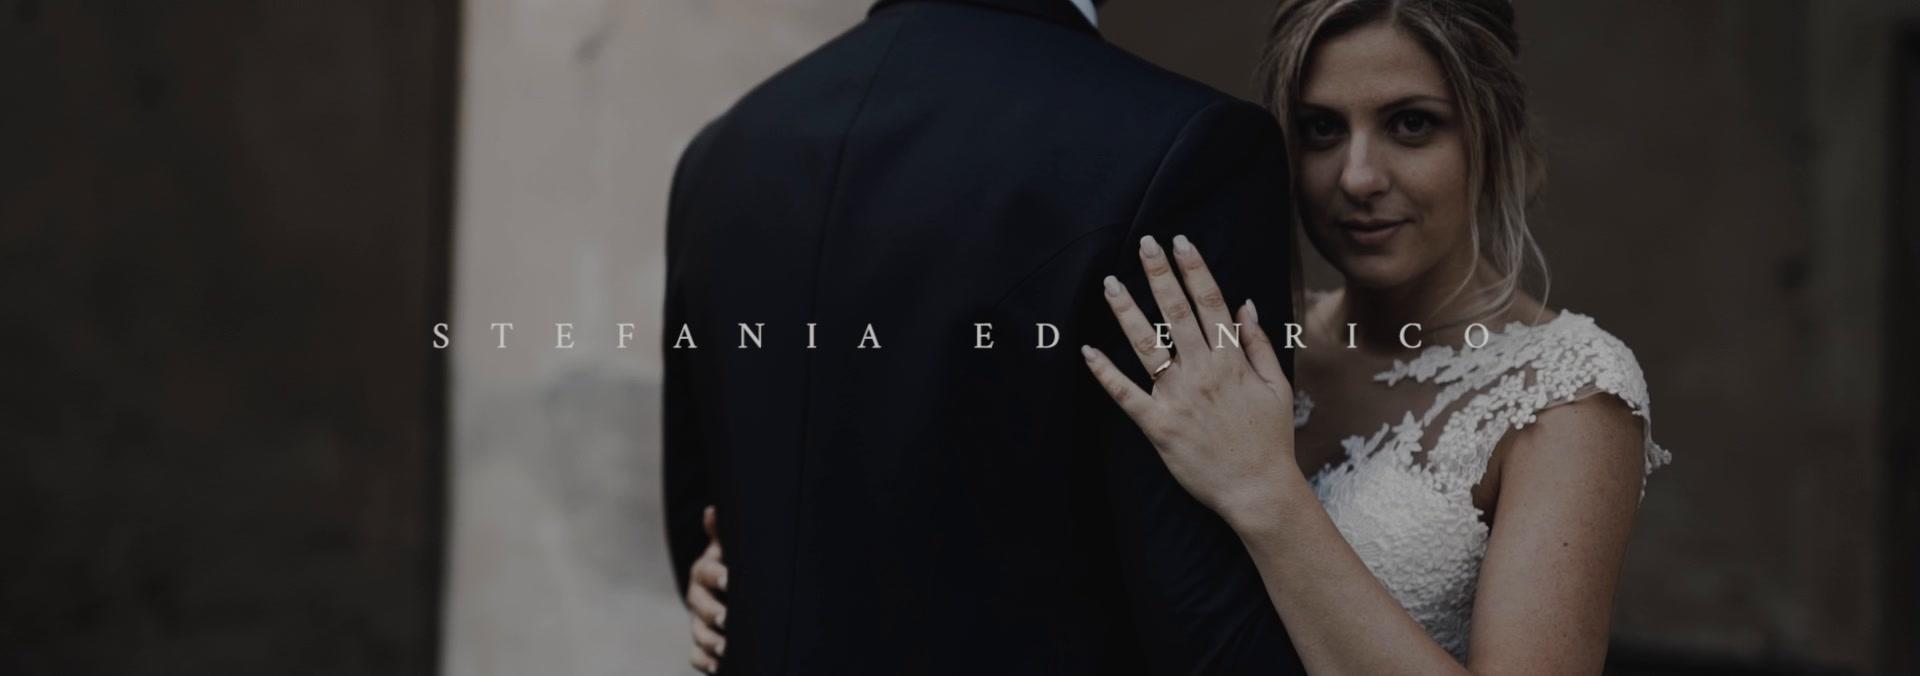 Stefania + Enrico | San Sebastiano da Po, Italy | a Catholic Church